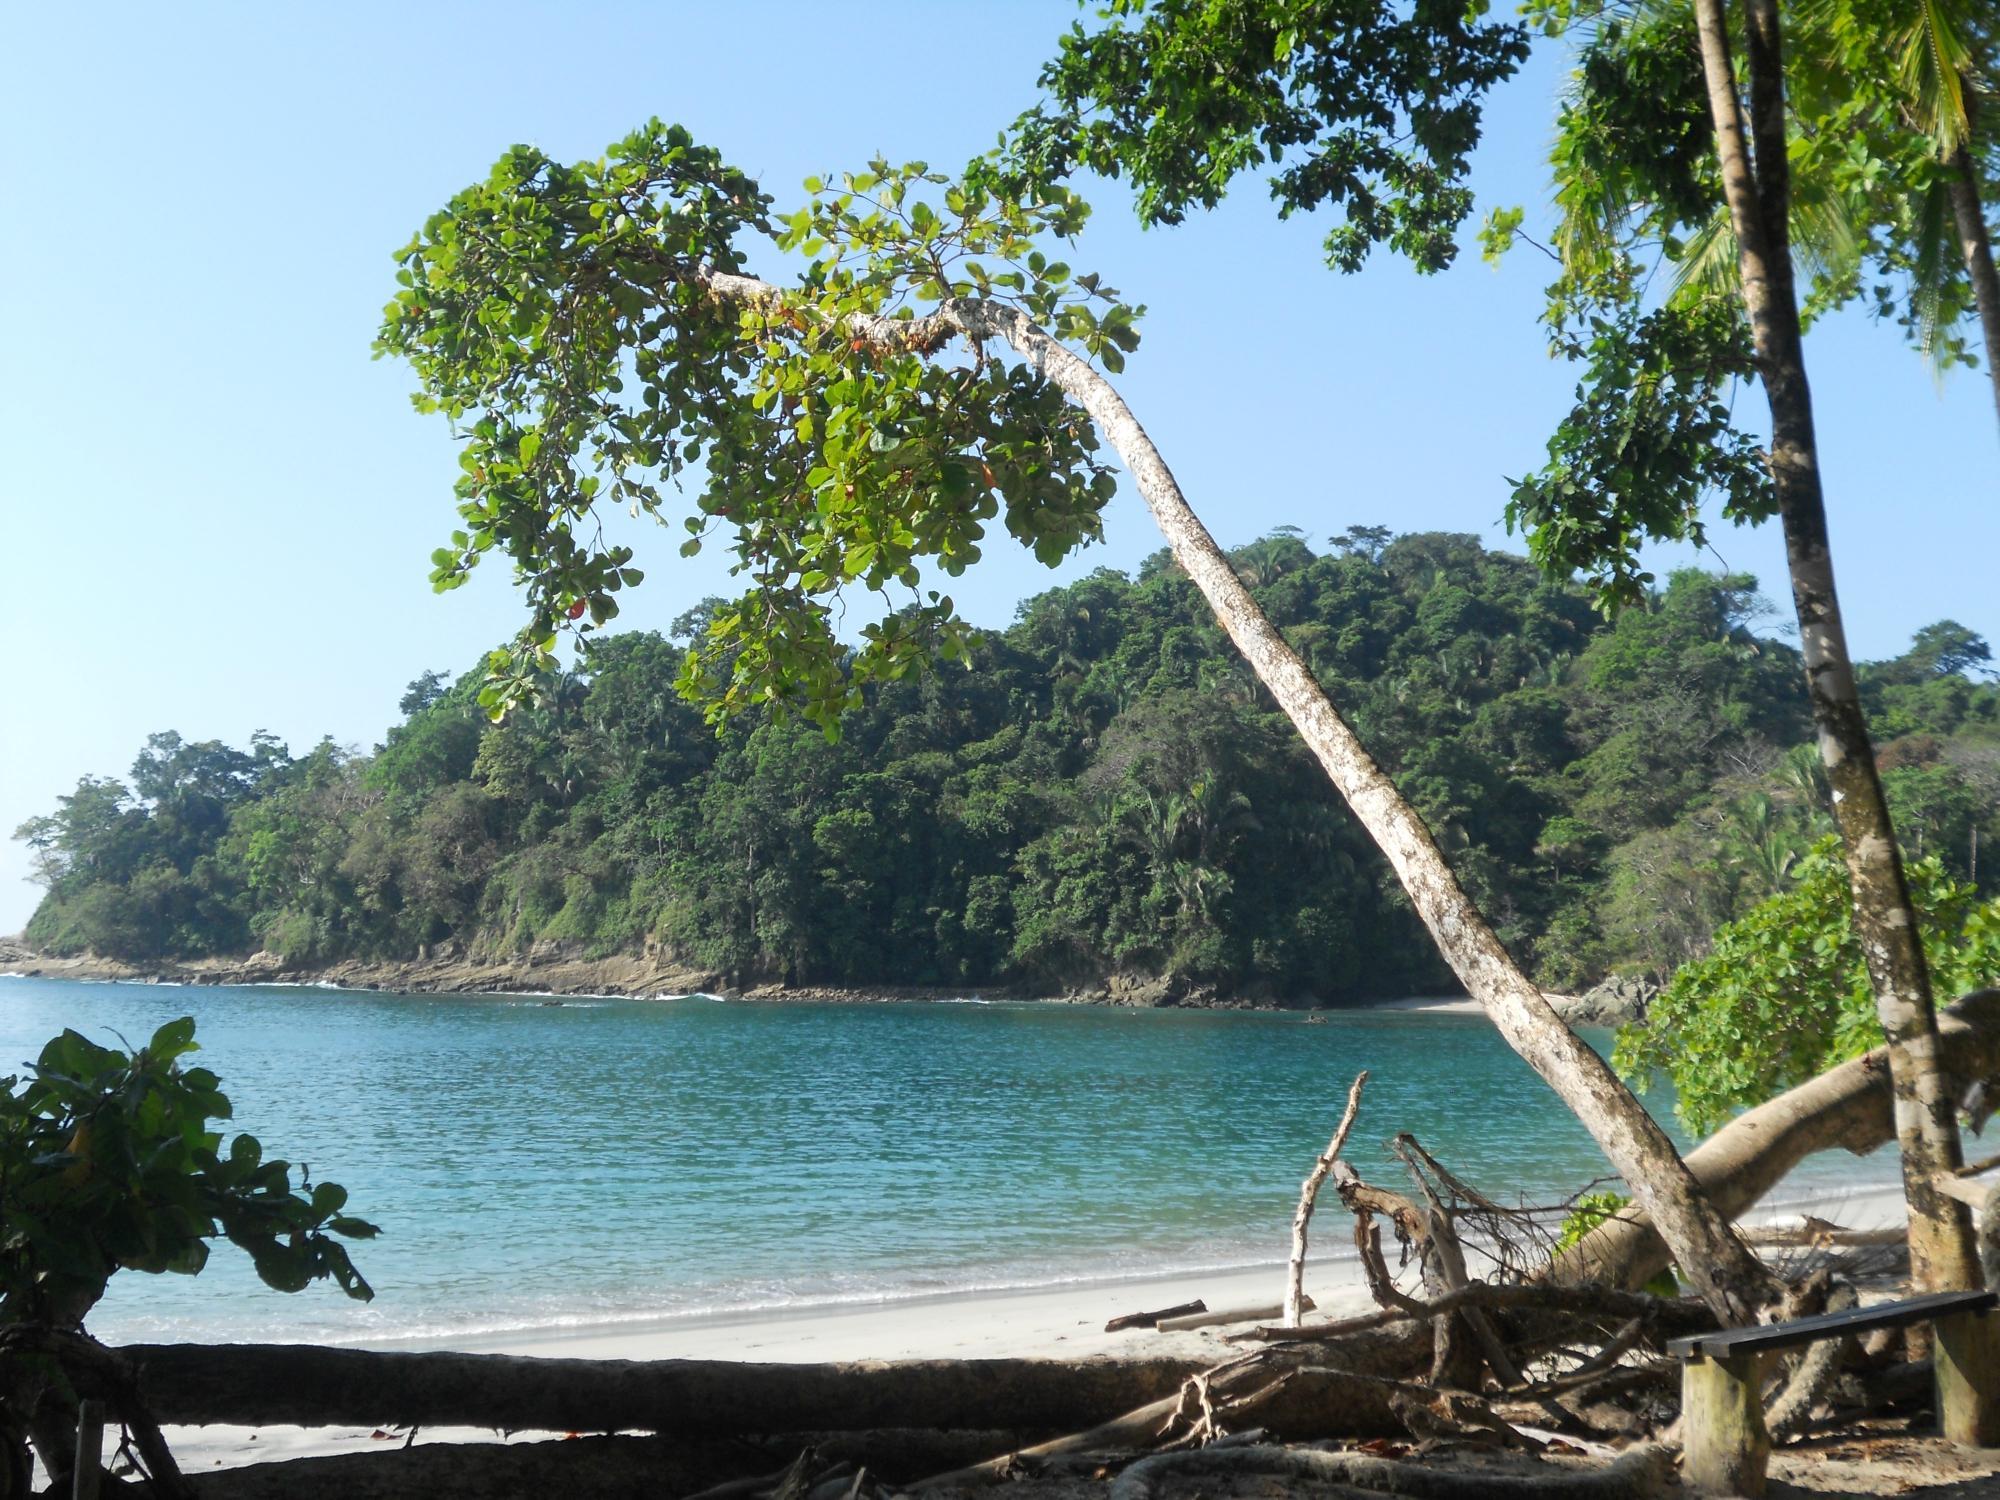 17. Playa Manuel Antonio